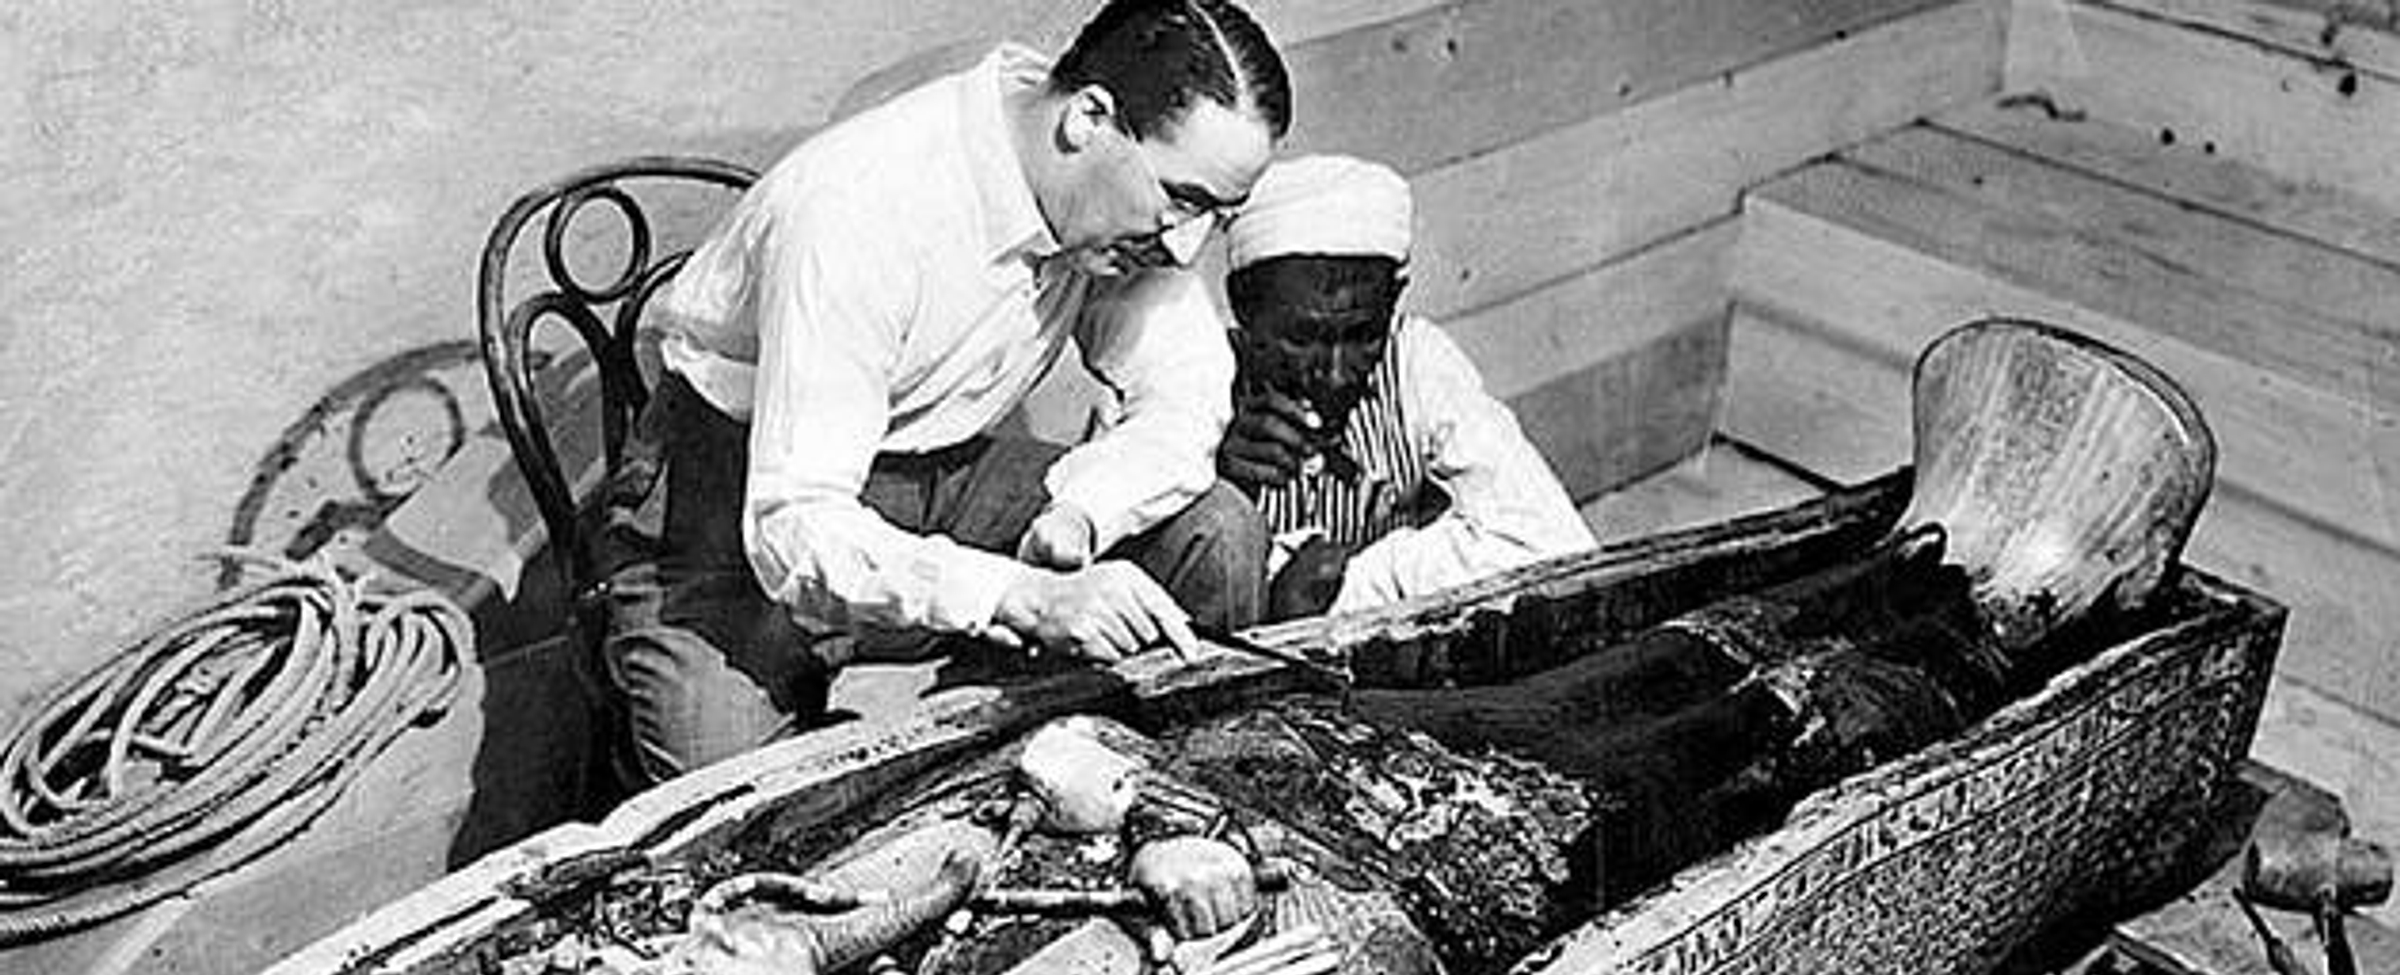 Jak zemřel Tutanchamon